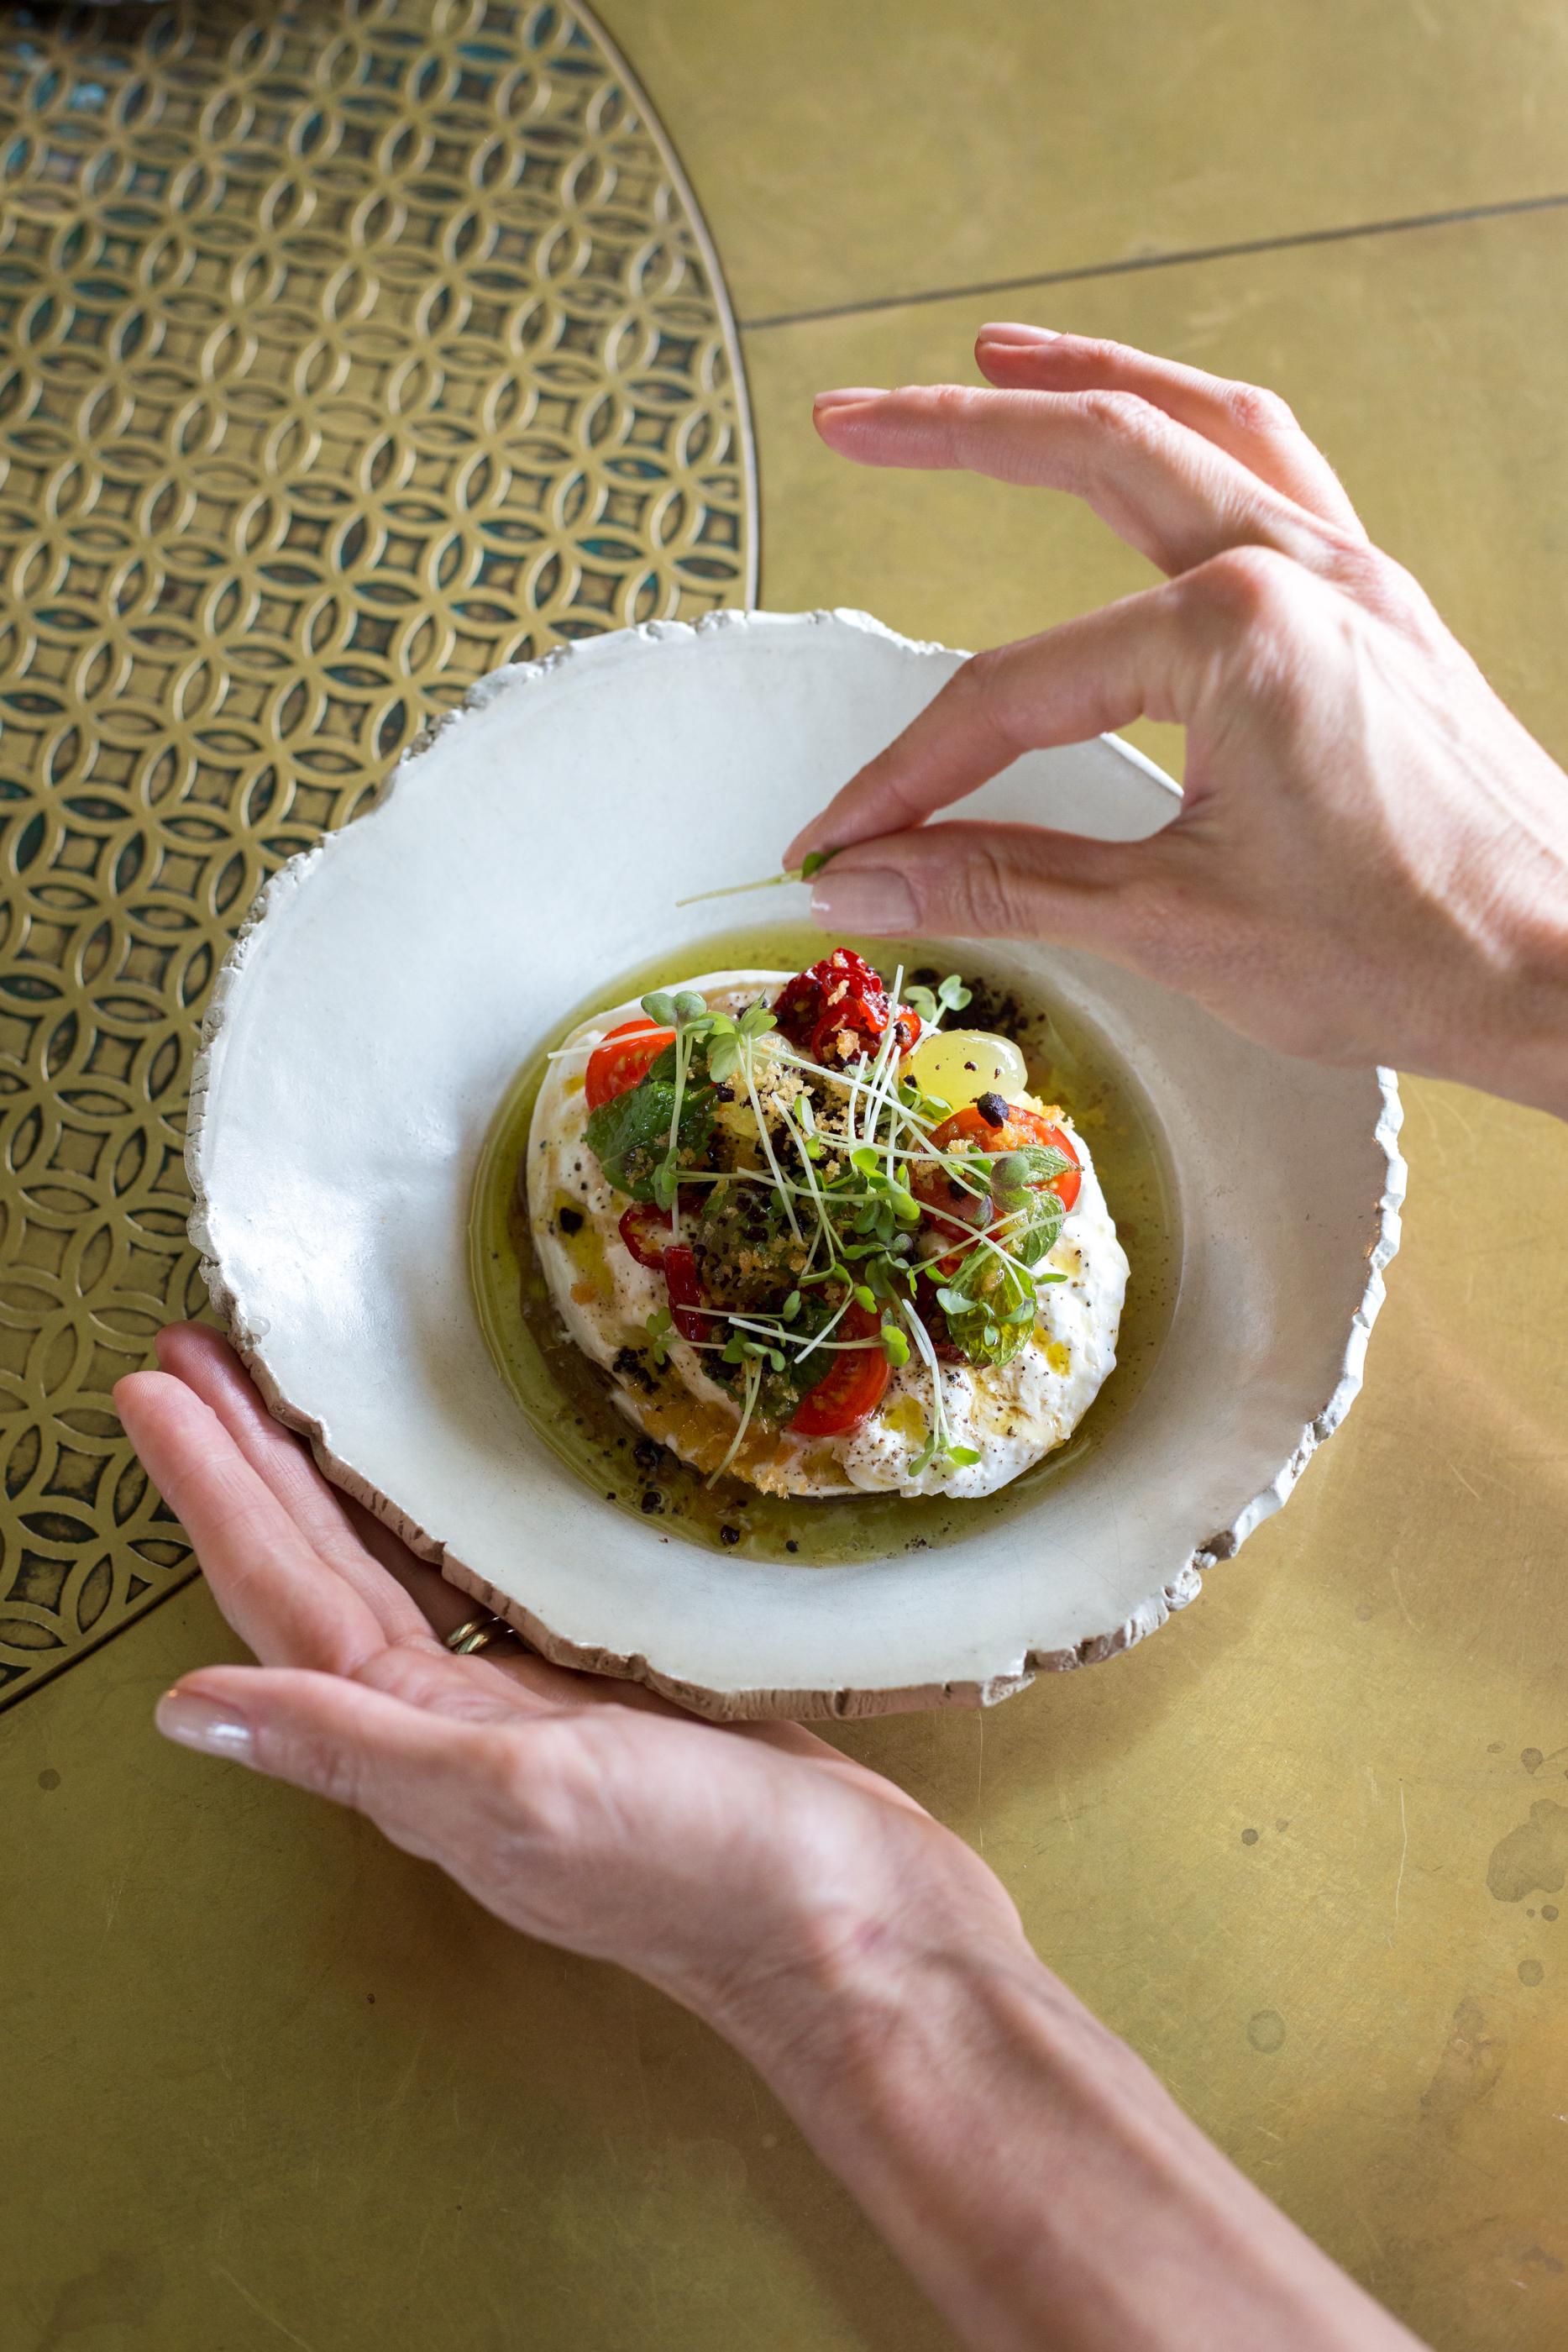 Lidija's Kitchen Spotlight - Coya Restaurant Dubai, UAE